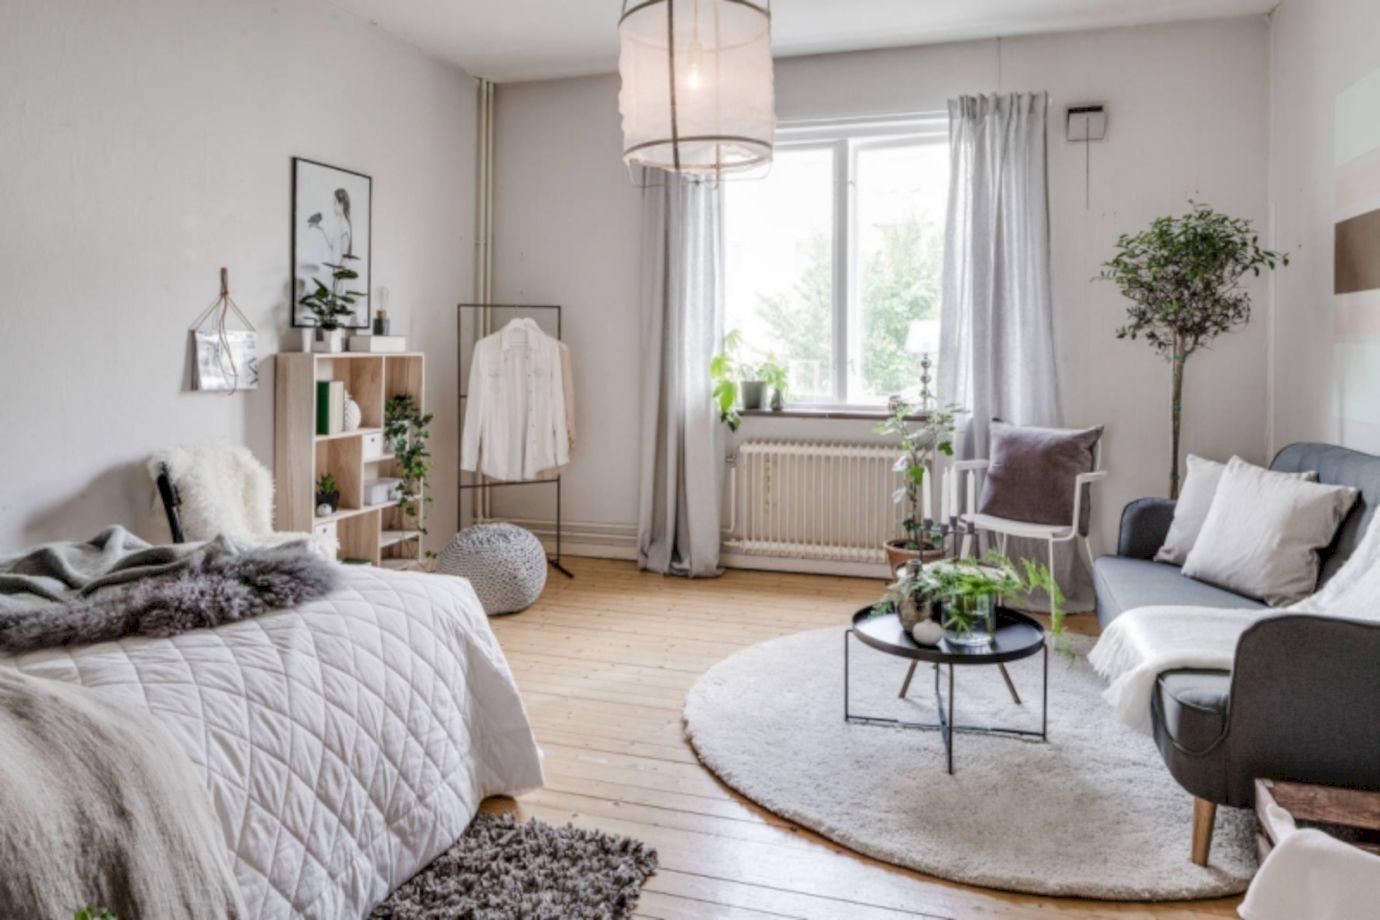 Small 1 Bedroom Apartment Decorating Ideas 50 Cozy ...